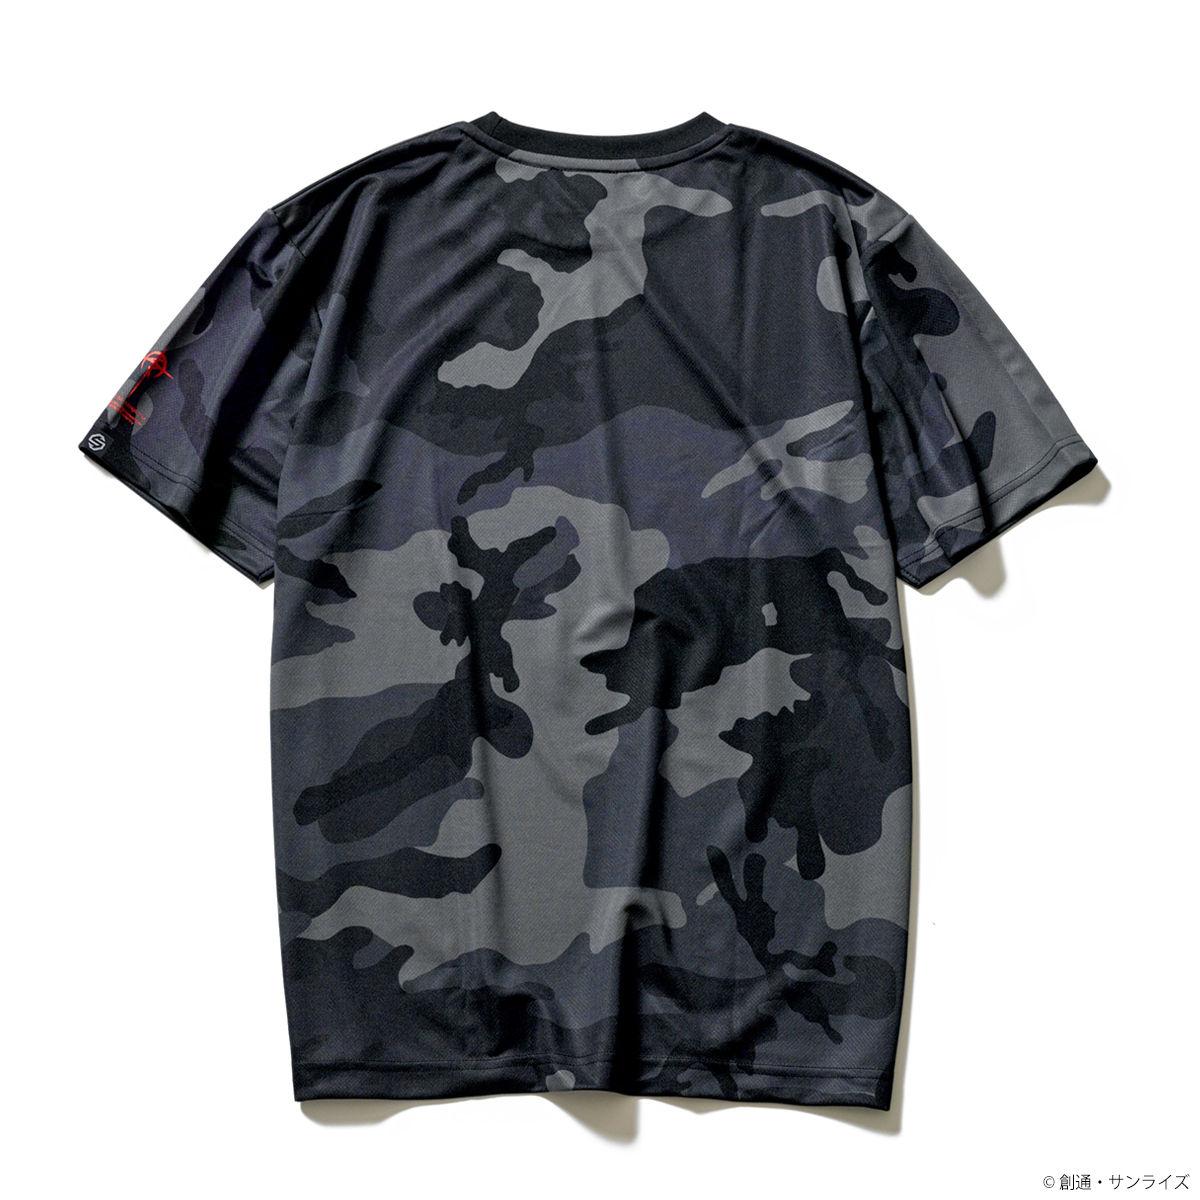 Mafty Camo Shirt—Mobile Suit Gundam Hathaway/STRICT-G Collaboration